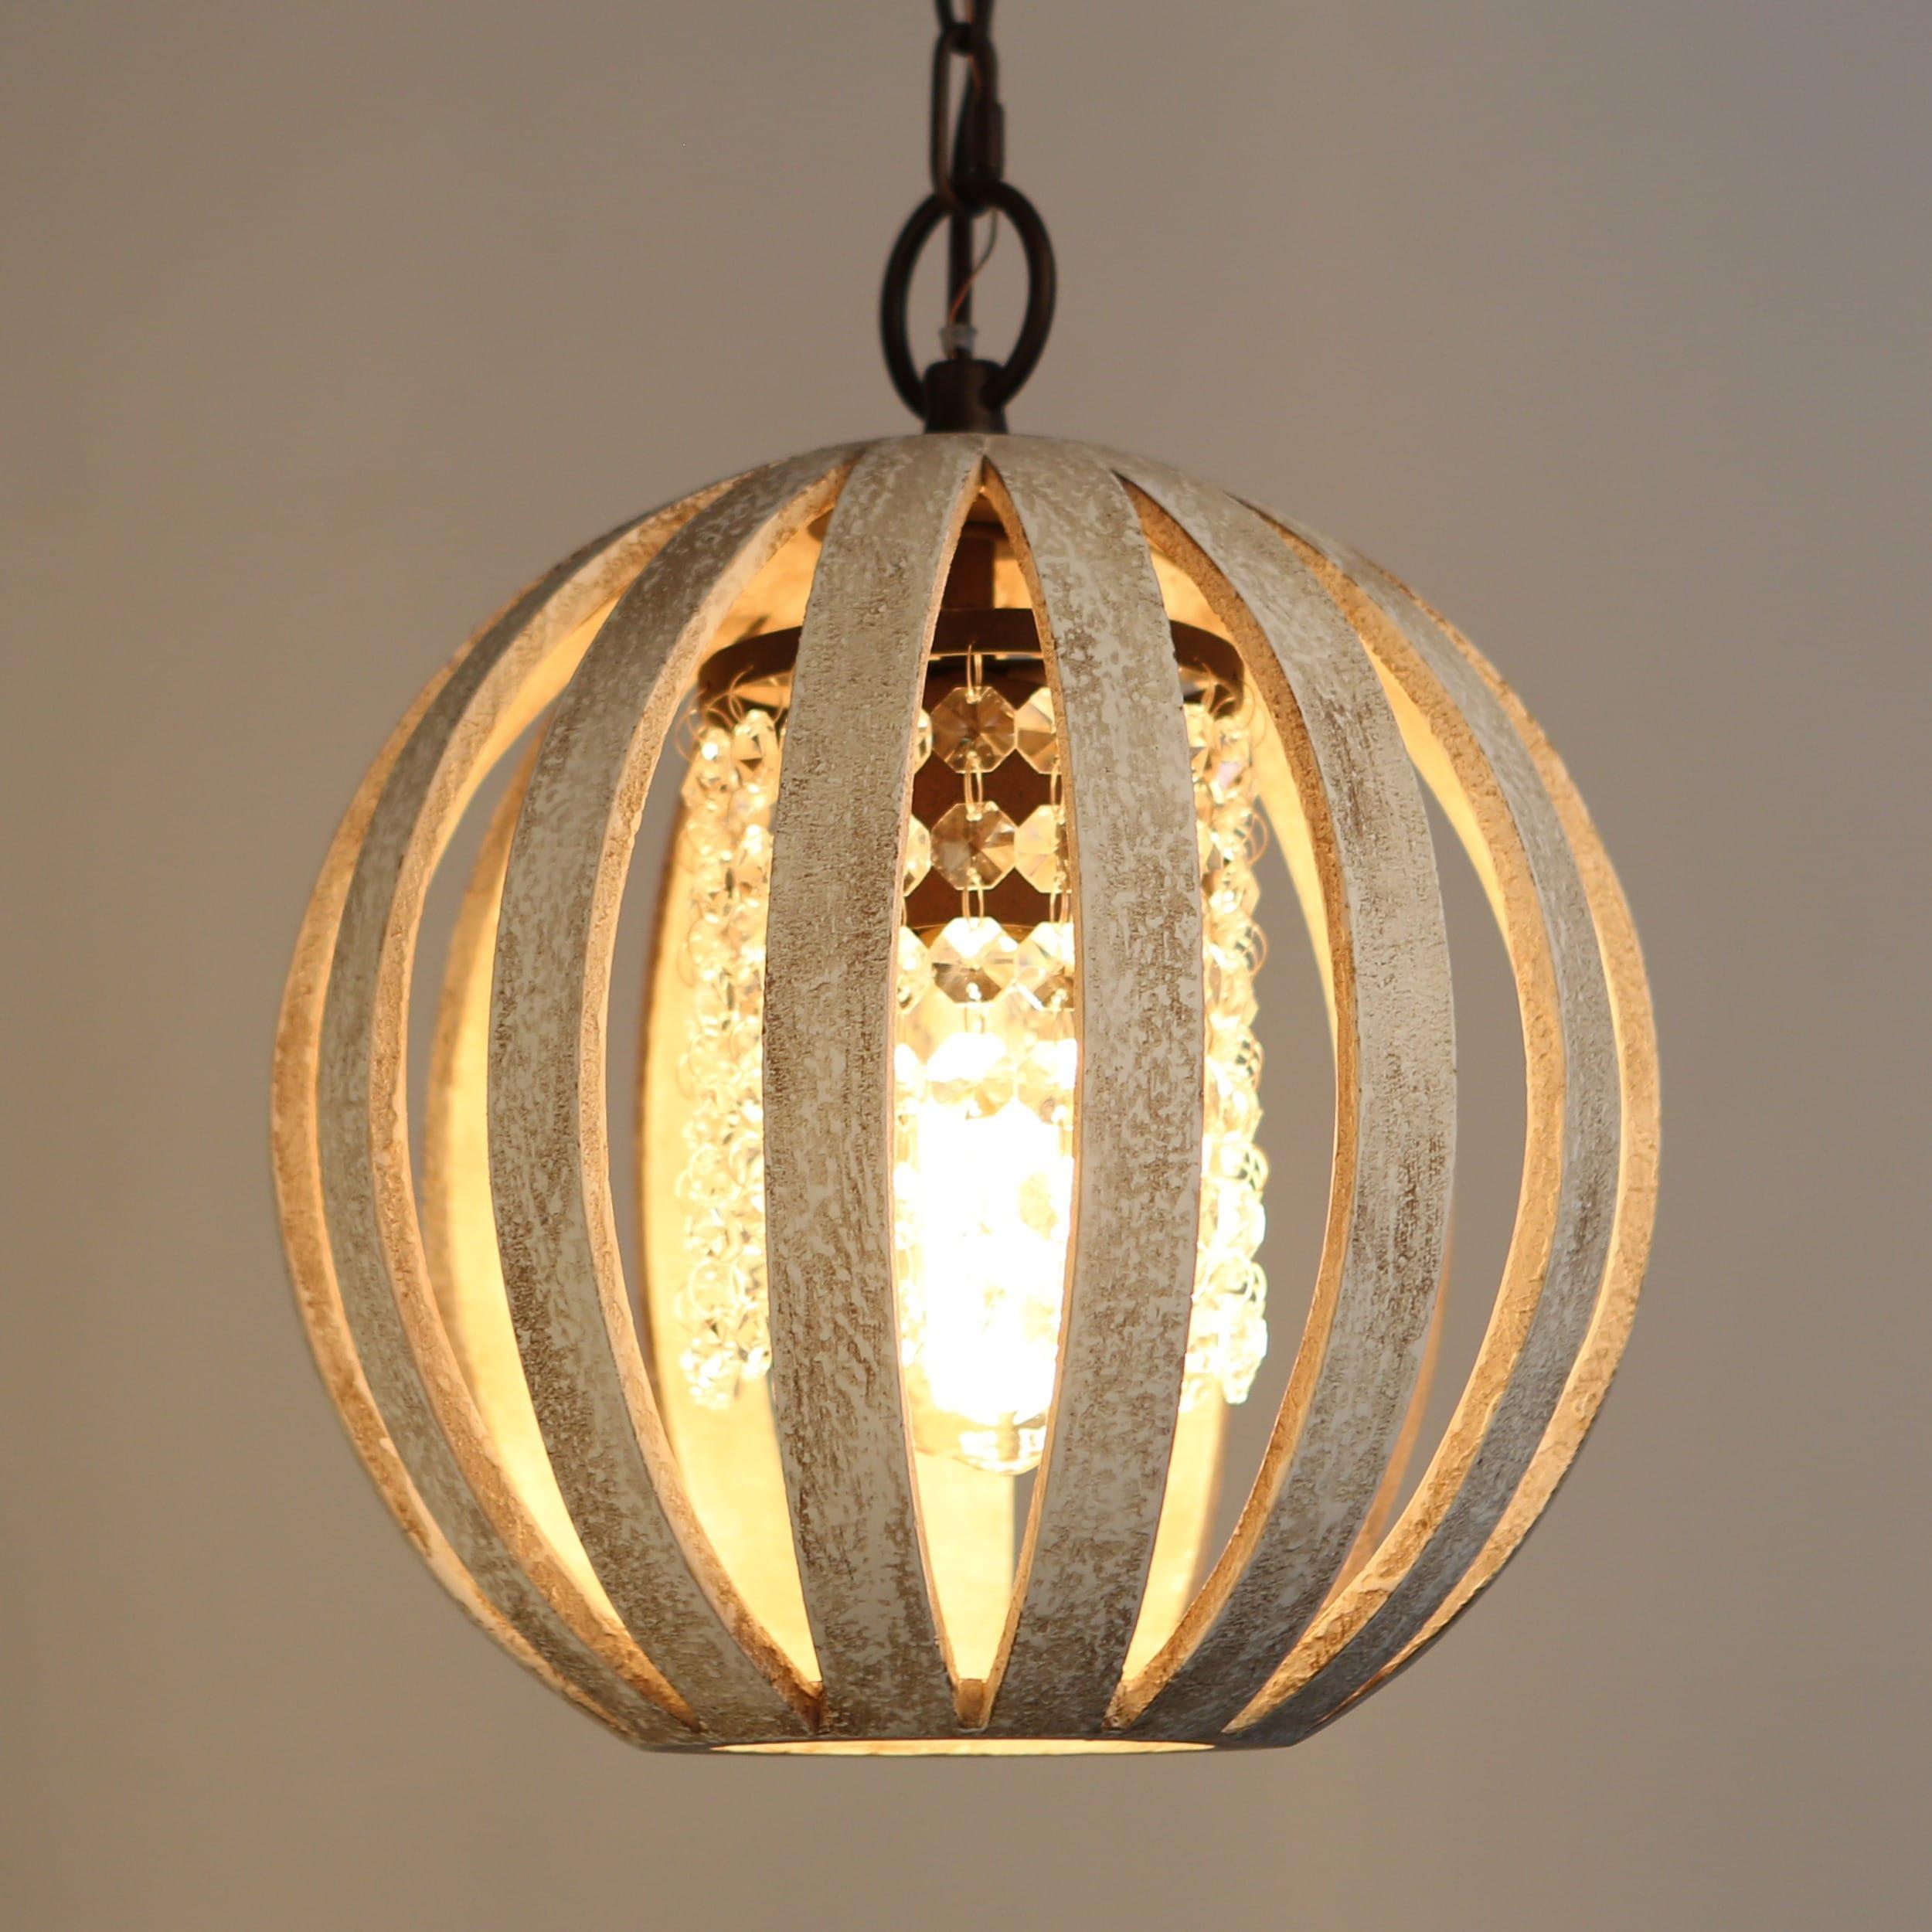 journee lighting. Journee Home \u0027Turin\u0027 Wood 12-inch Hardwired Pendant Lamp - Free Shipping Today Overstock 23426322 Lighting Overstock.com